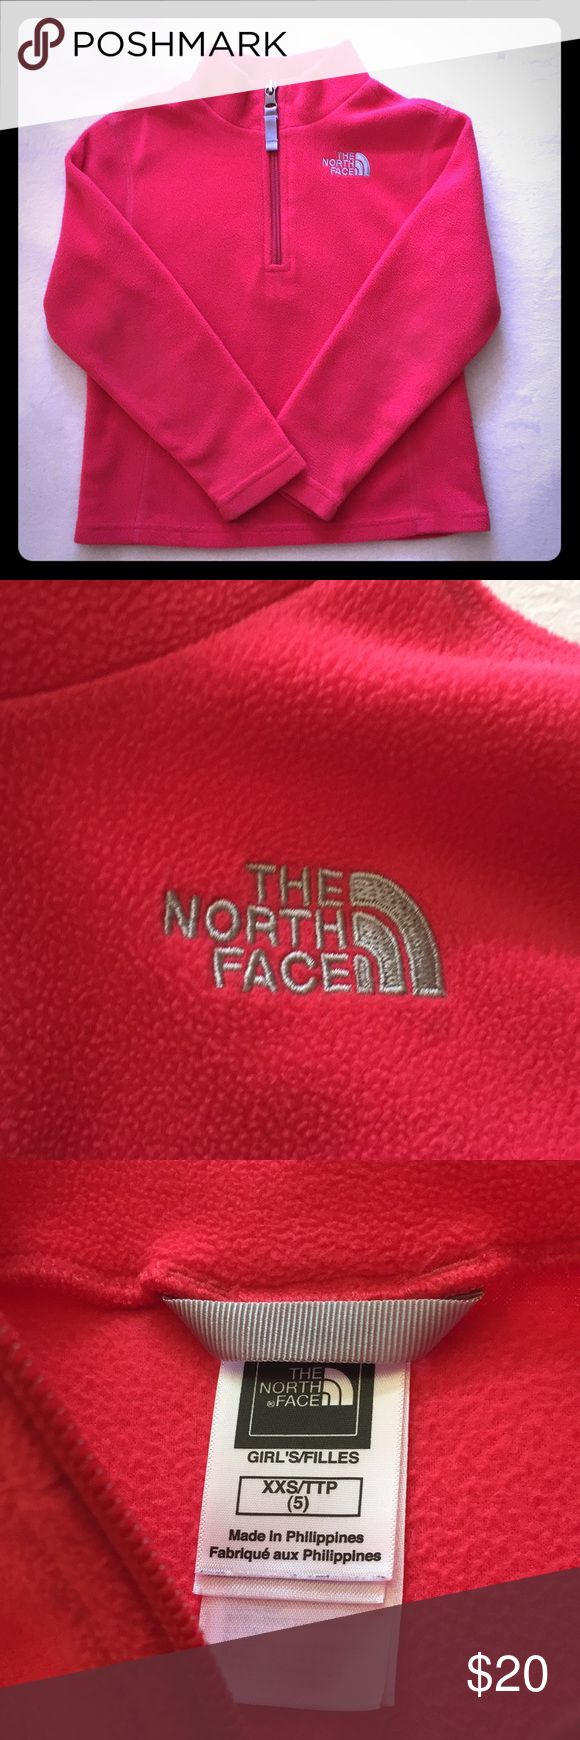 North Face Girls Glacier 1/4 Zip Fleece XXS (5) Bright warm lightweight fleece pullover. In excellent condition. Size XXS (5) The North Face Shirts & Tops Sweatshirts & Hoodies